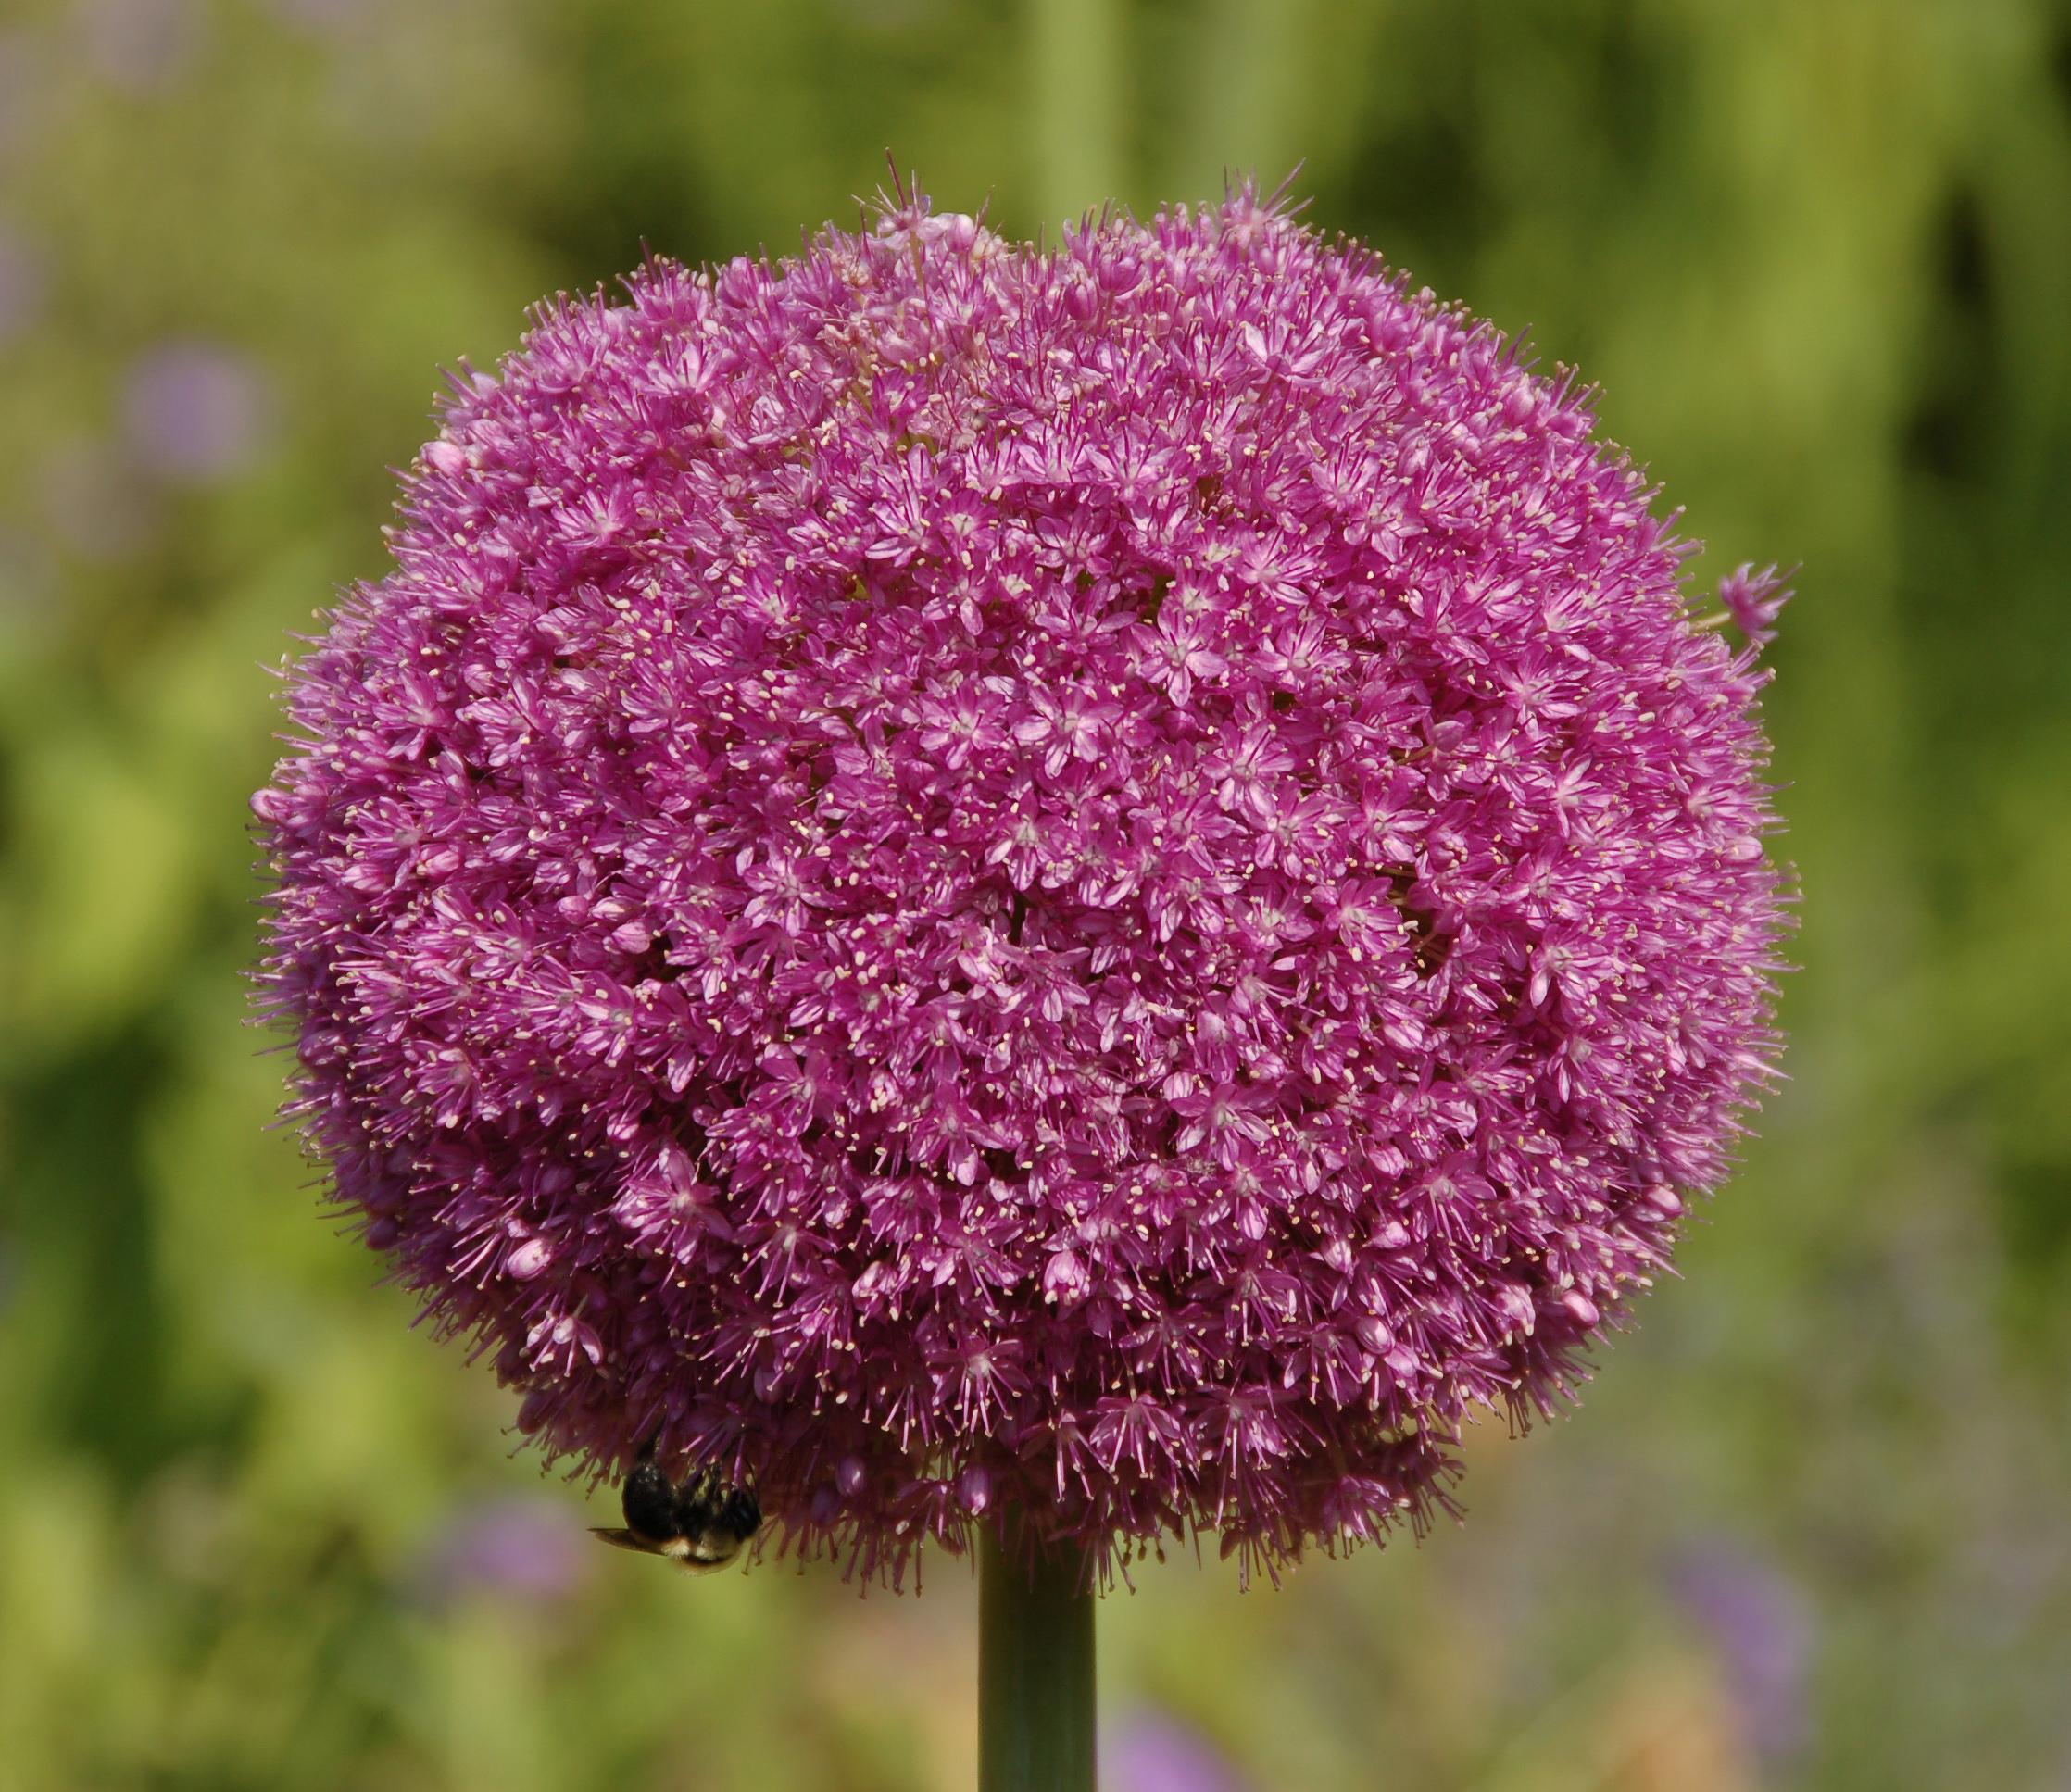 File Allium Lucy Ball Pink Flower Head 2236px Jpg